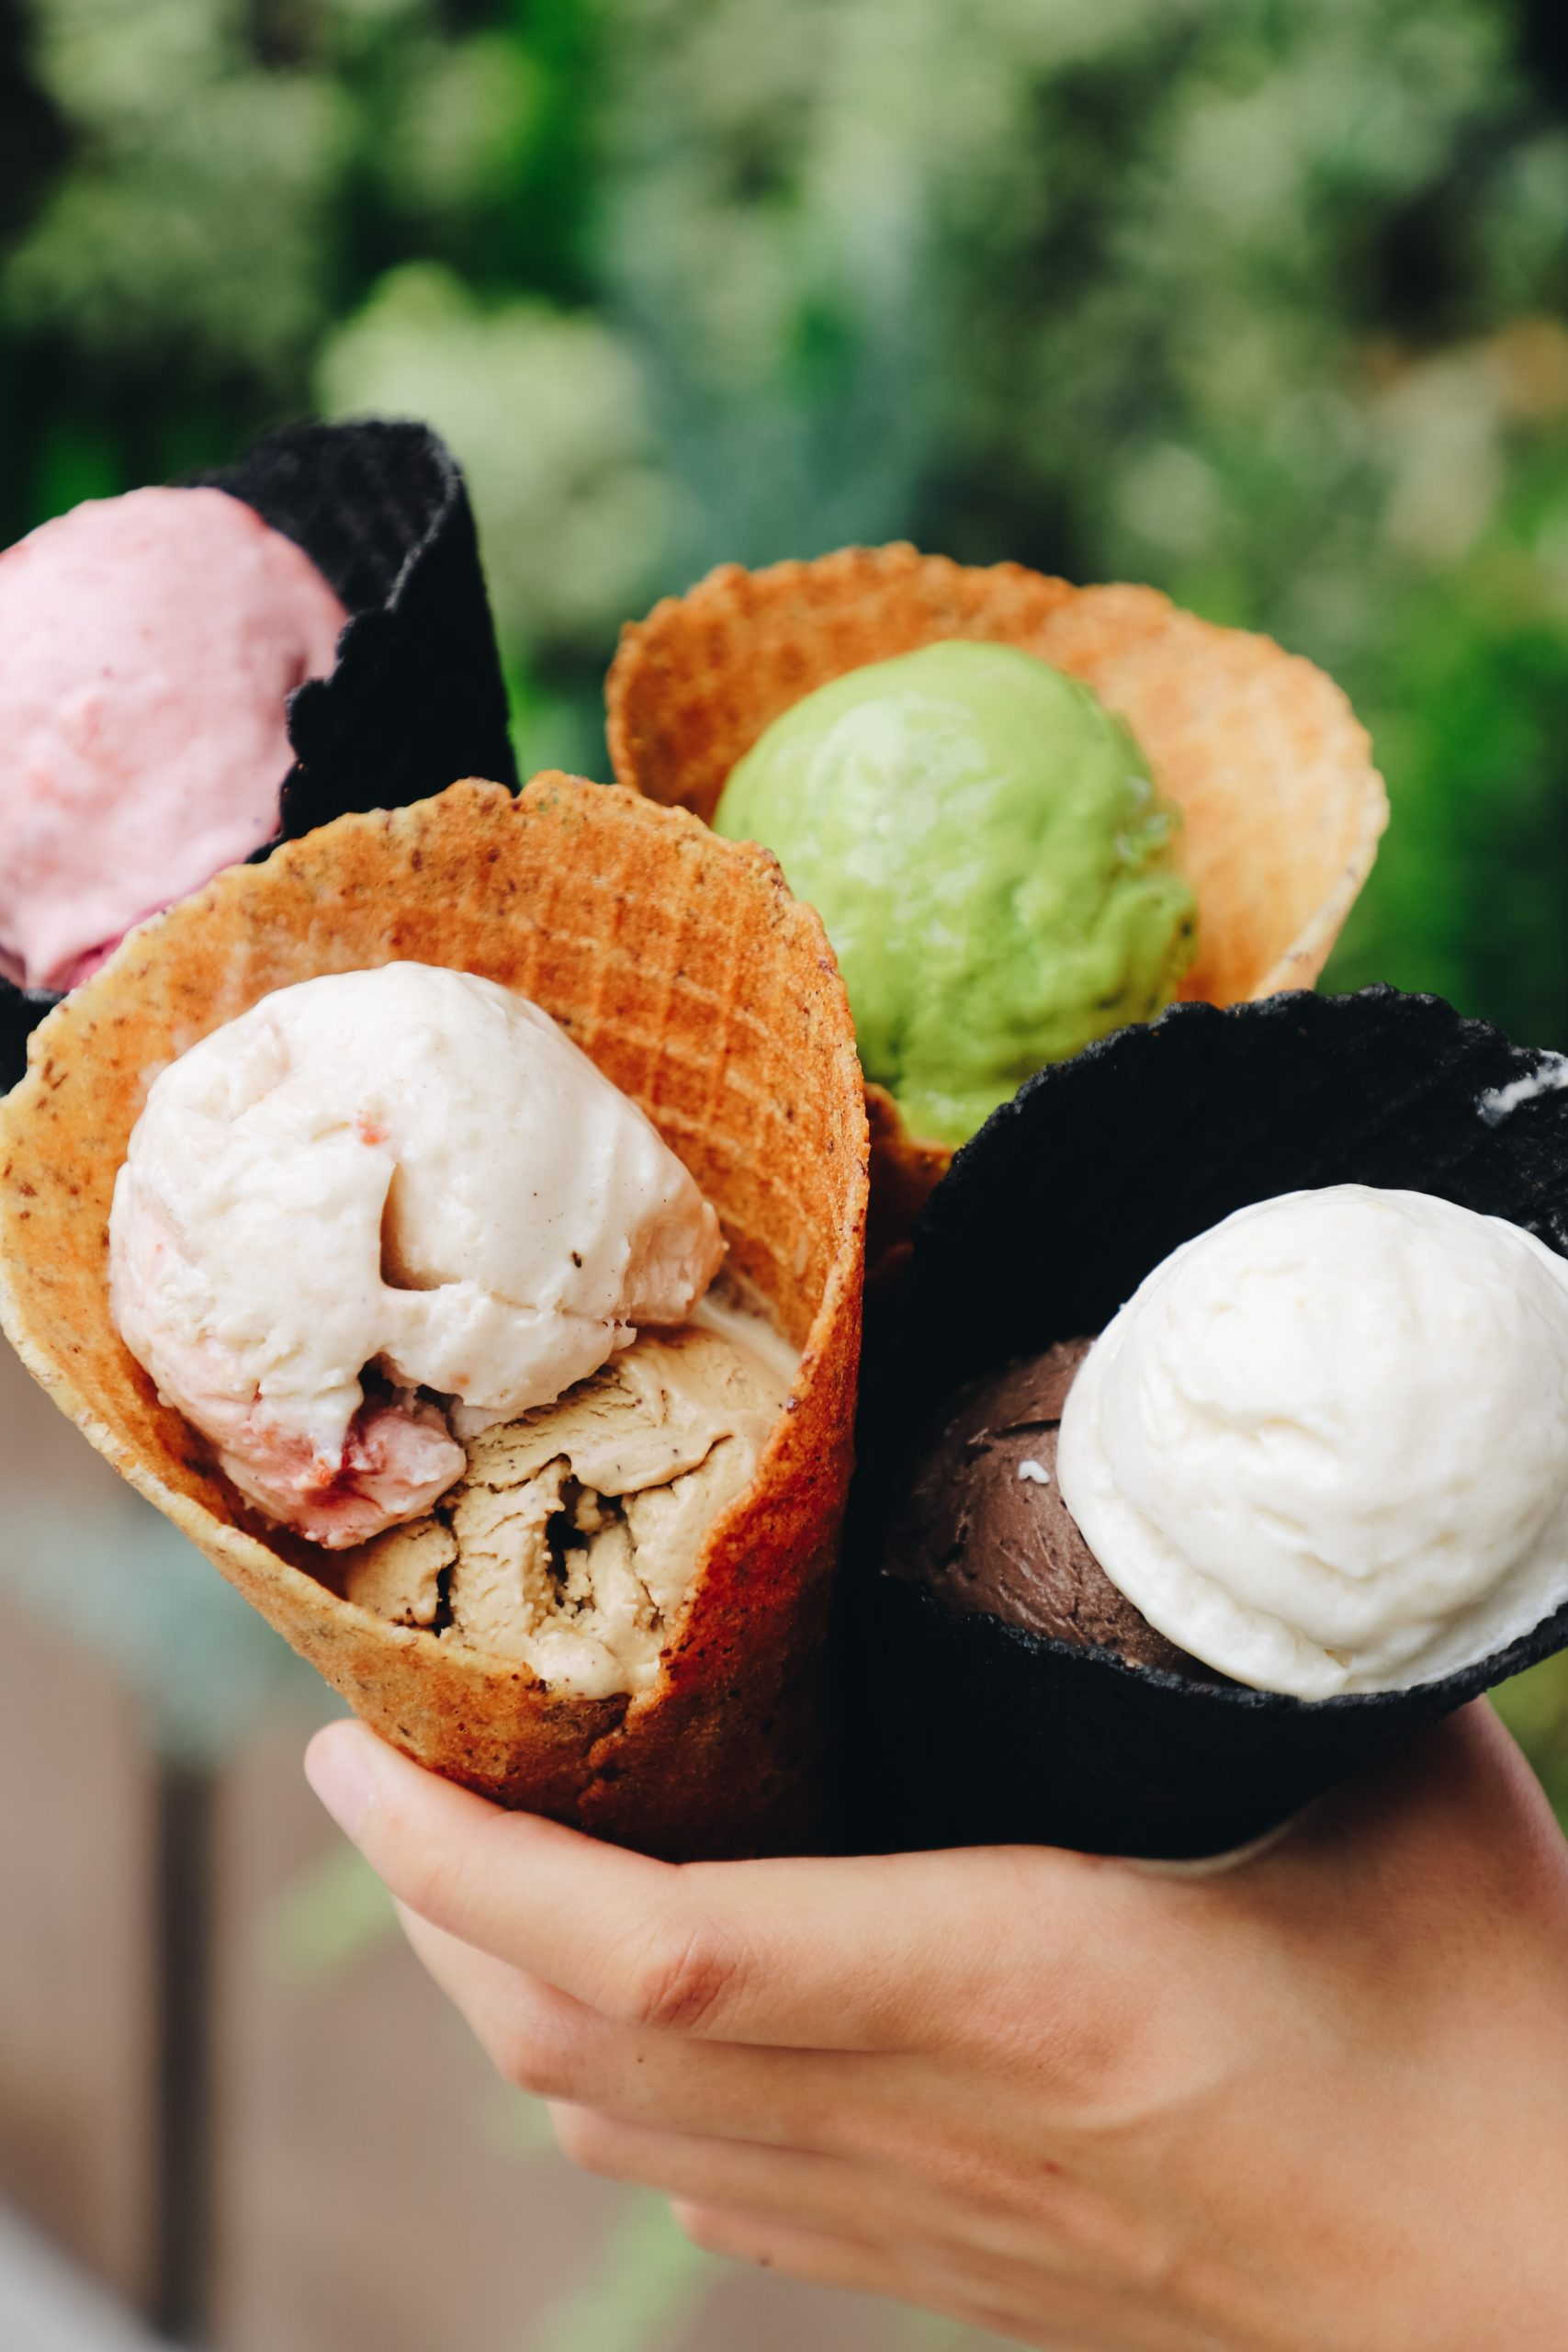 Toms River Ice Cream Shop Falls Victim to Murphy Minimum Wage Increase, Shuts Doors Permanently